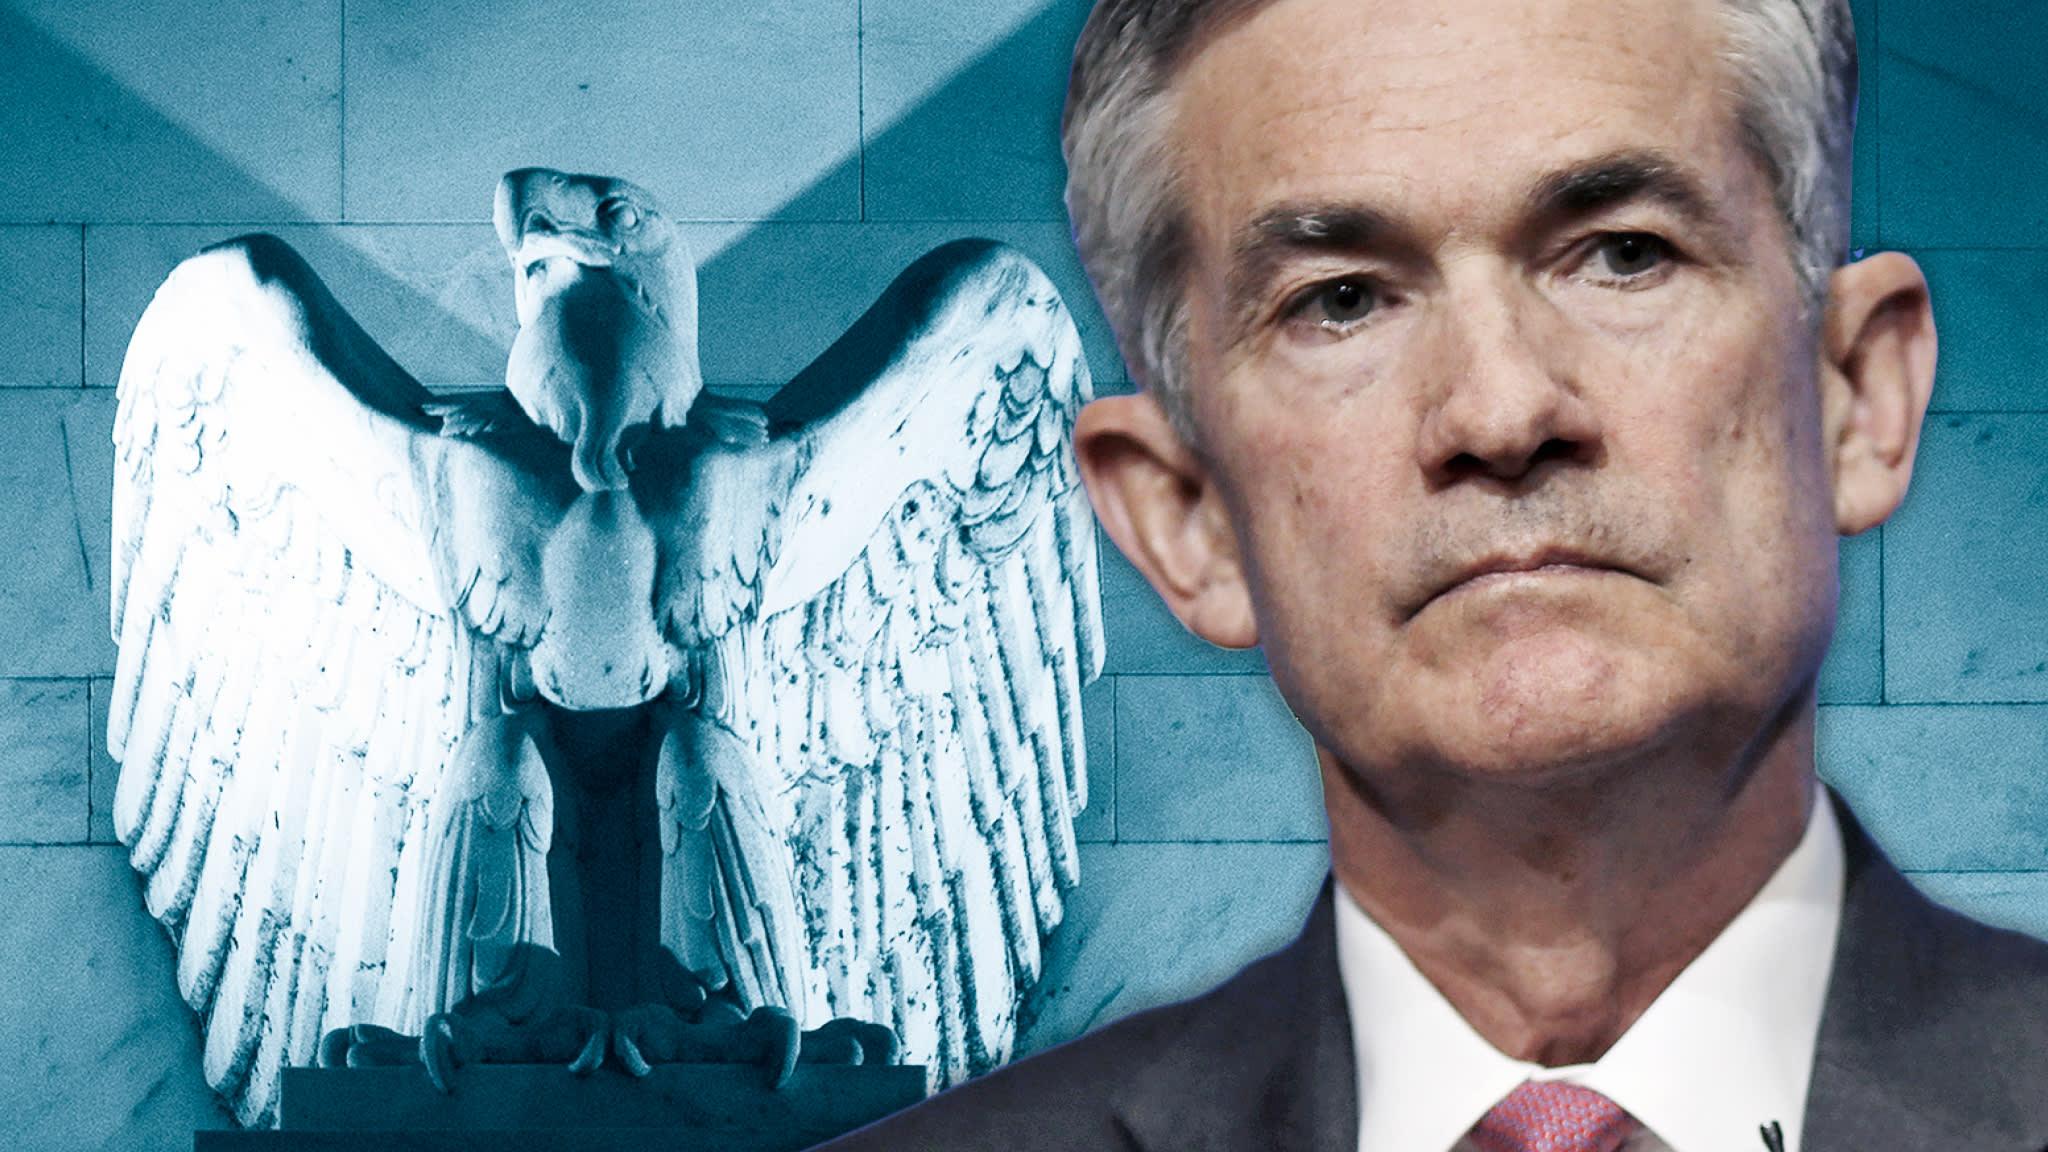 Rising optimism on US economy triggers bond sell-off